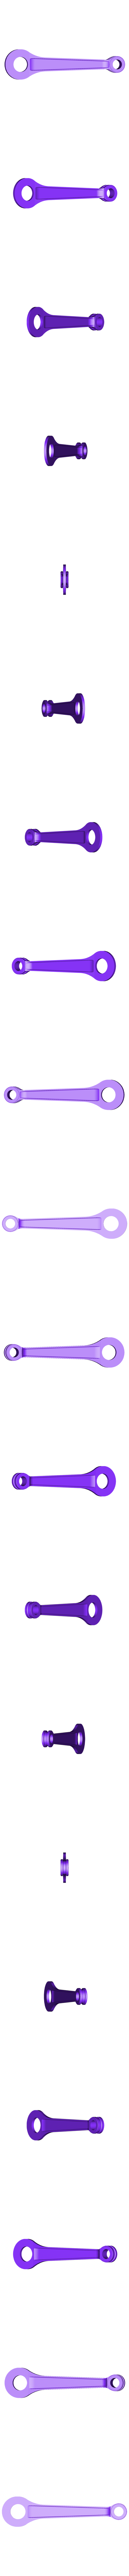 Back_Rod.STL Download free STL file 4-8-8-4 Big Boy Locomotive • 3D printer object, RaymondDeLuca